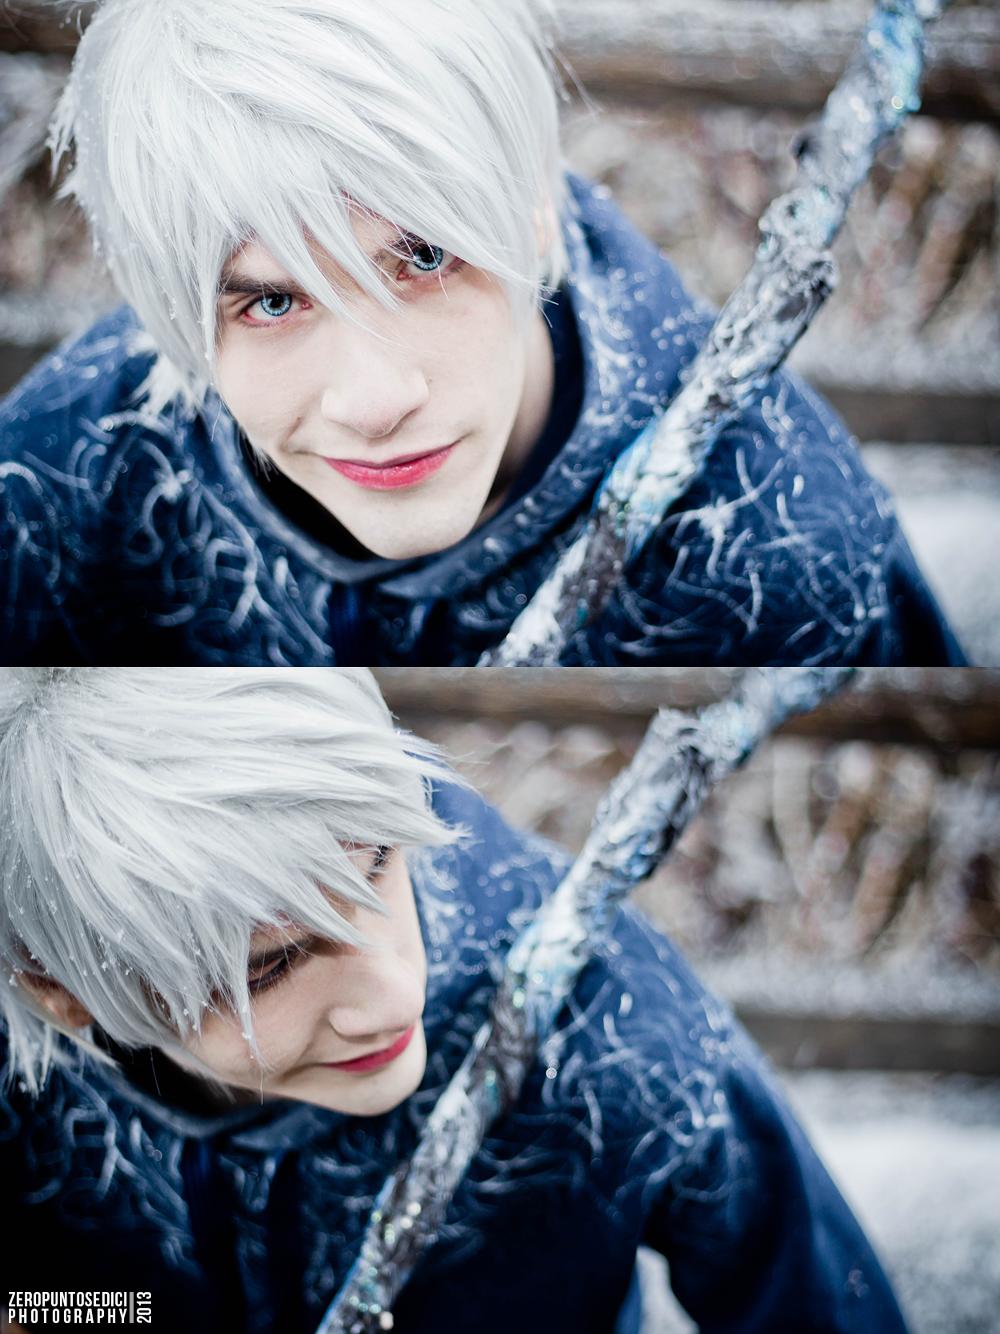 My name is Jack Frost by YamatoTaichou